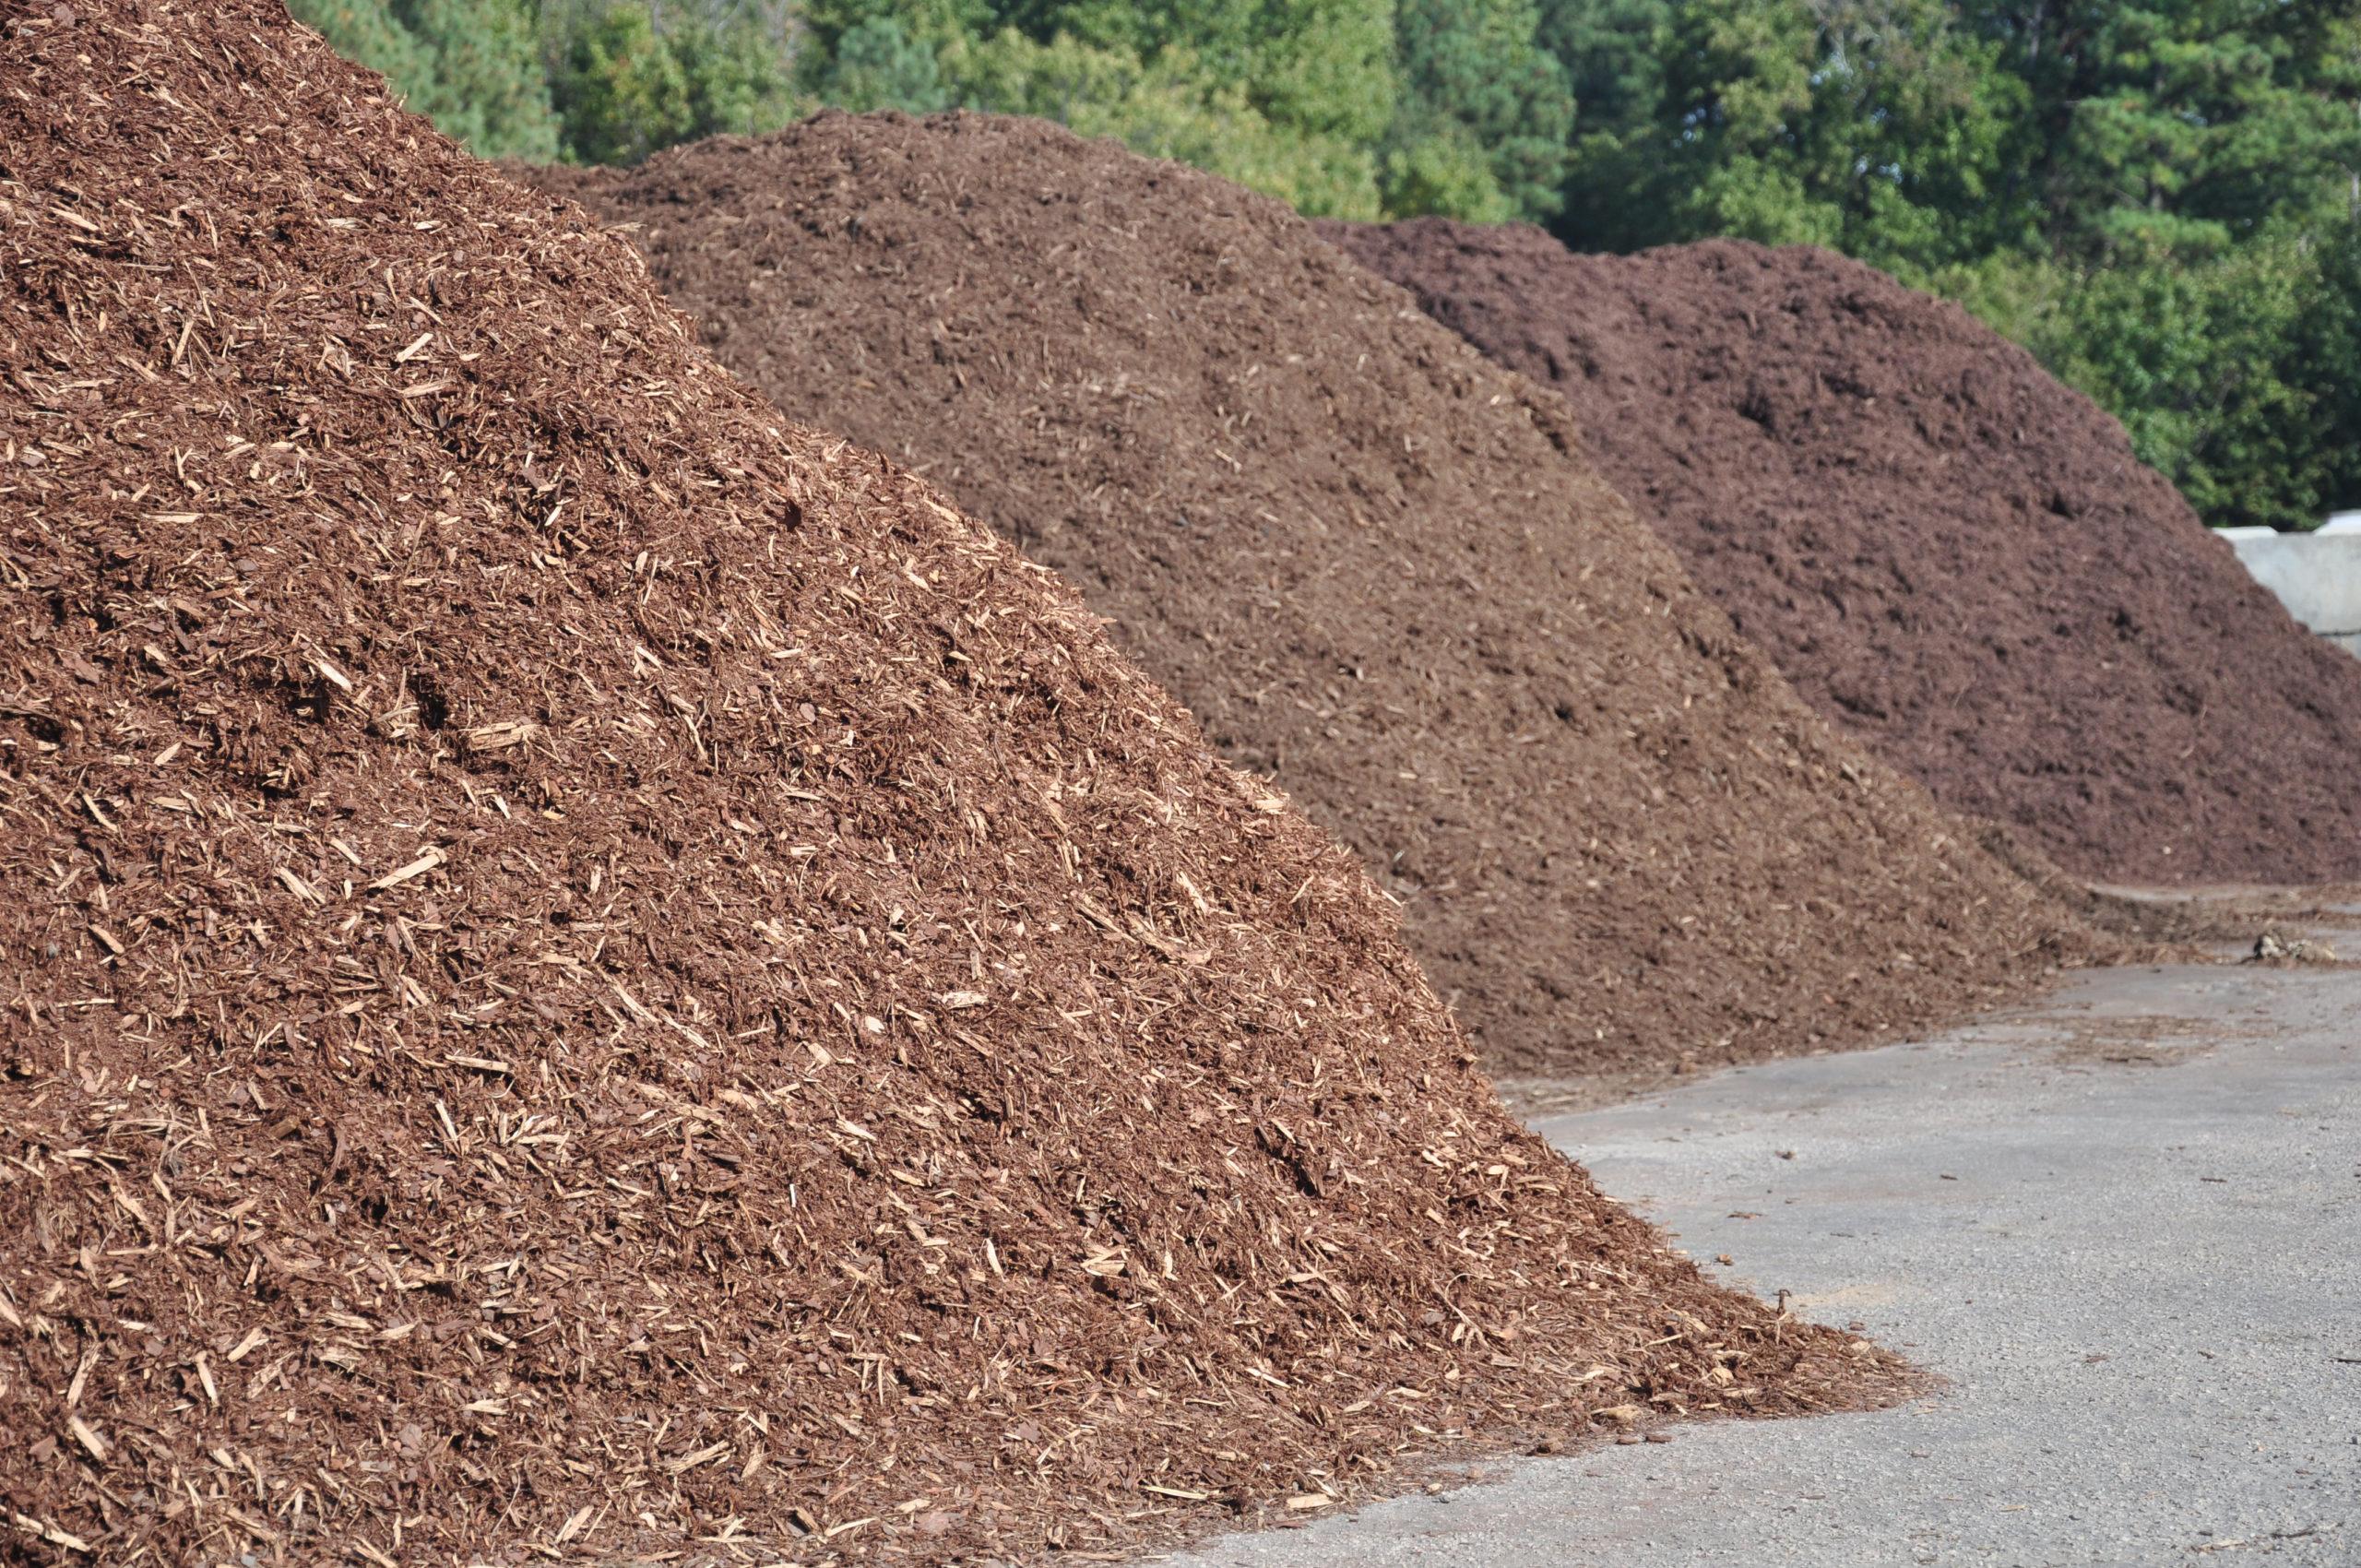 piles of mulch